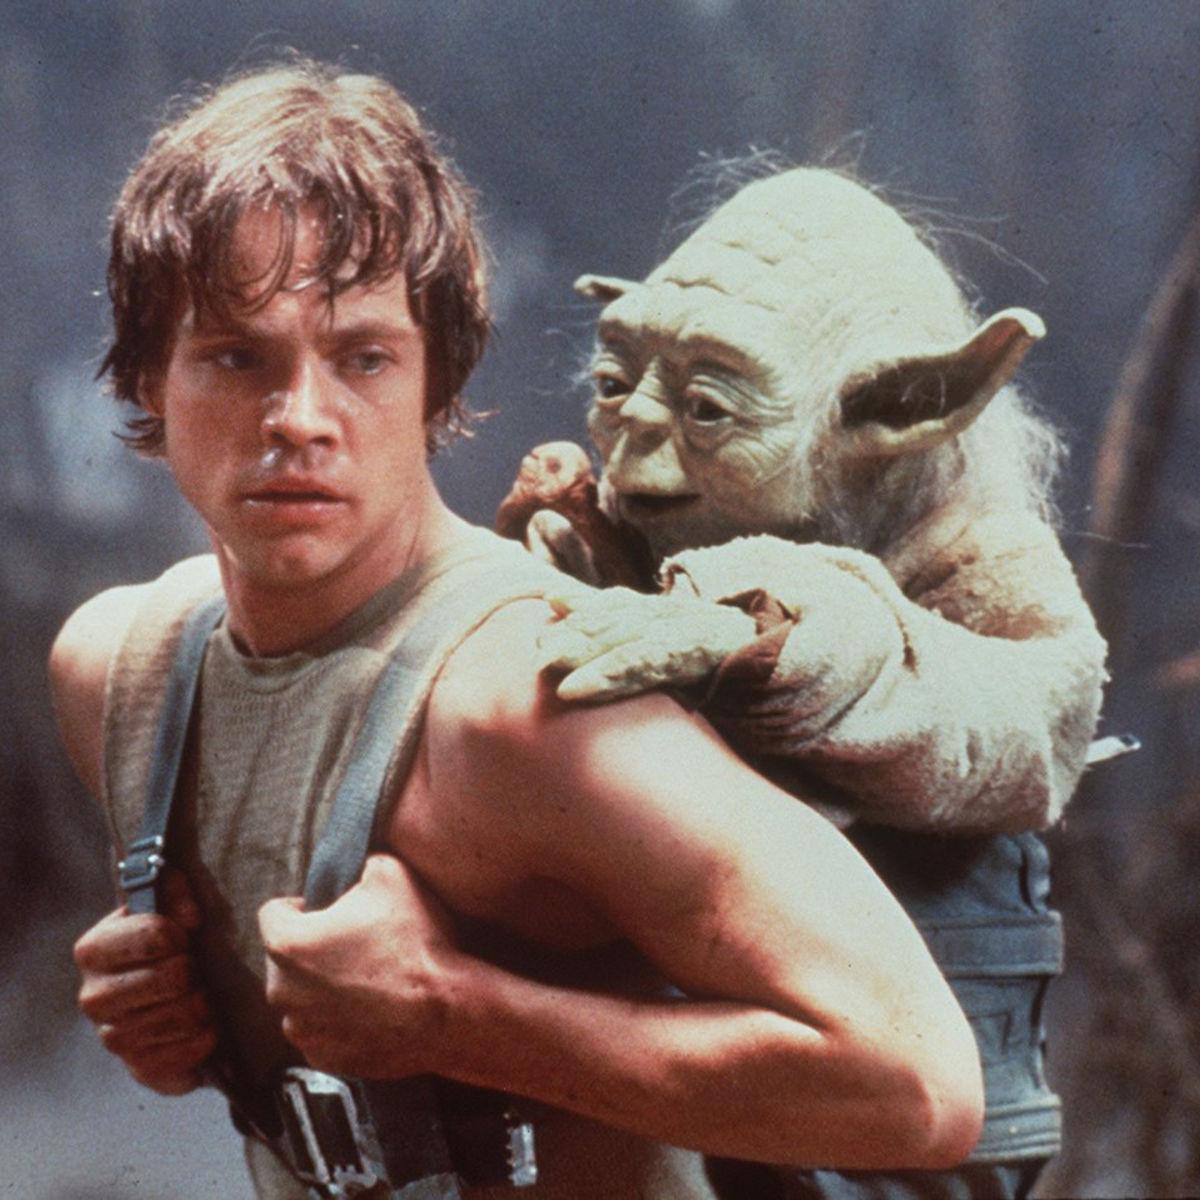 luke-empire-so-wait-luke-skywalker-s-how-old-now.jpeg